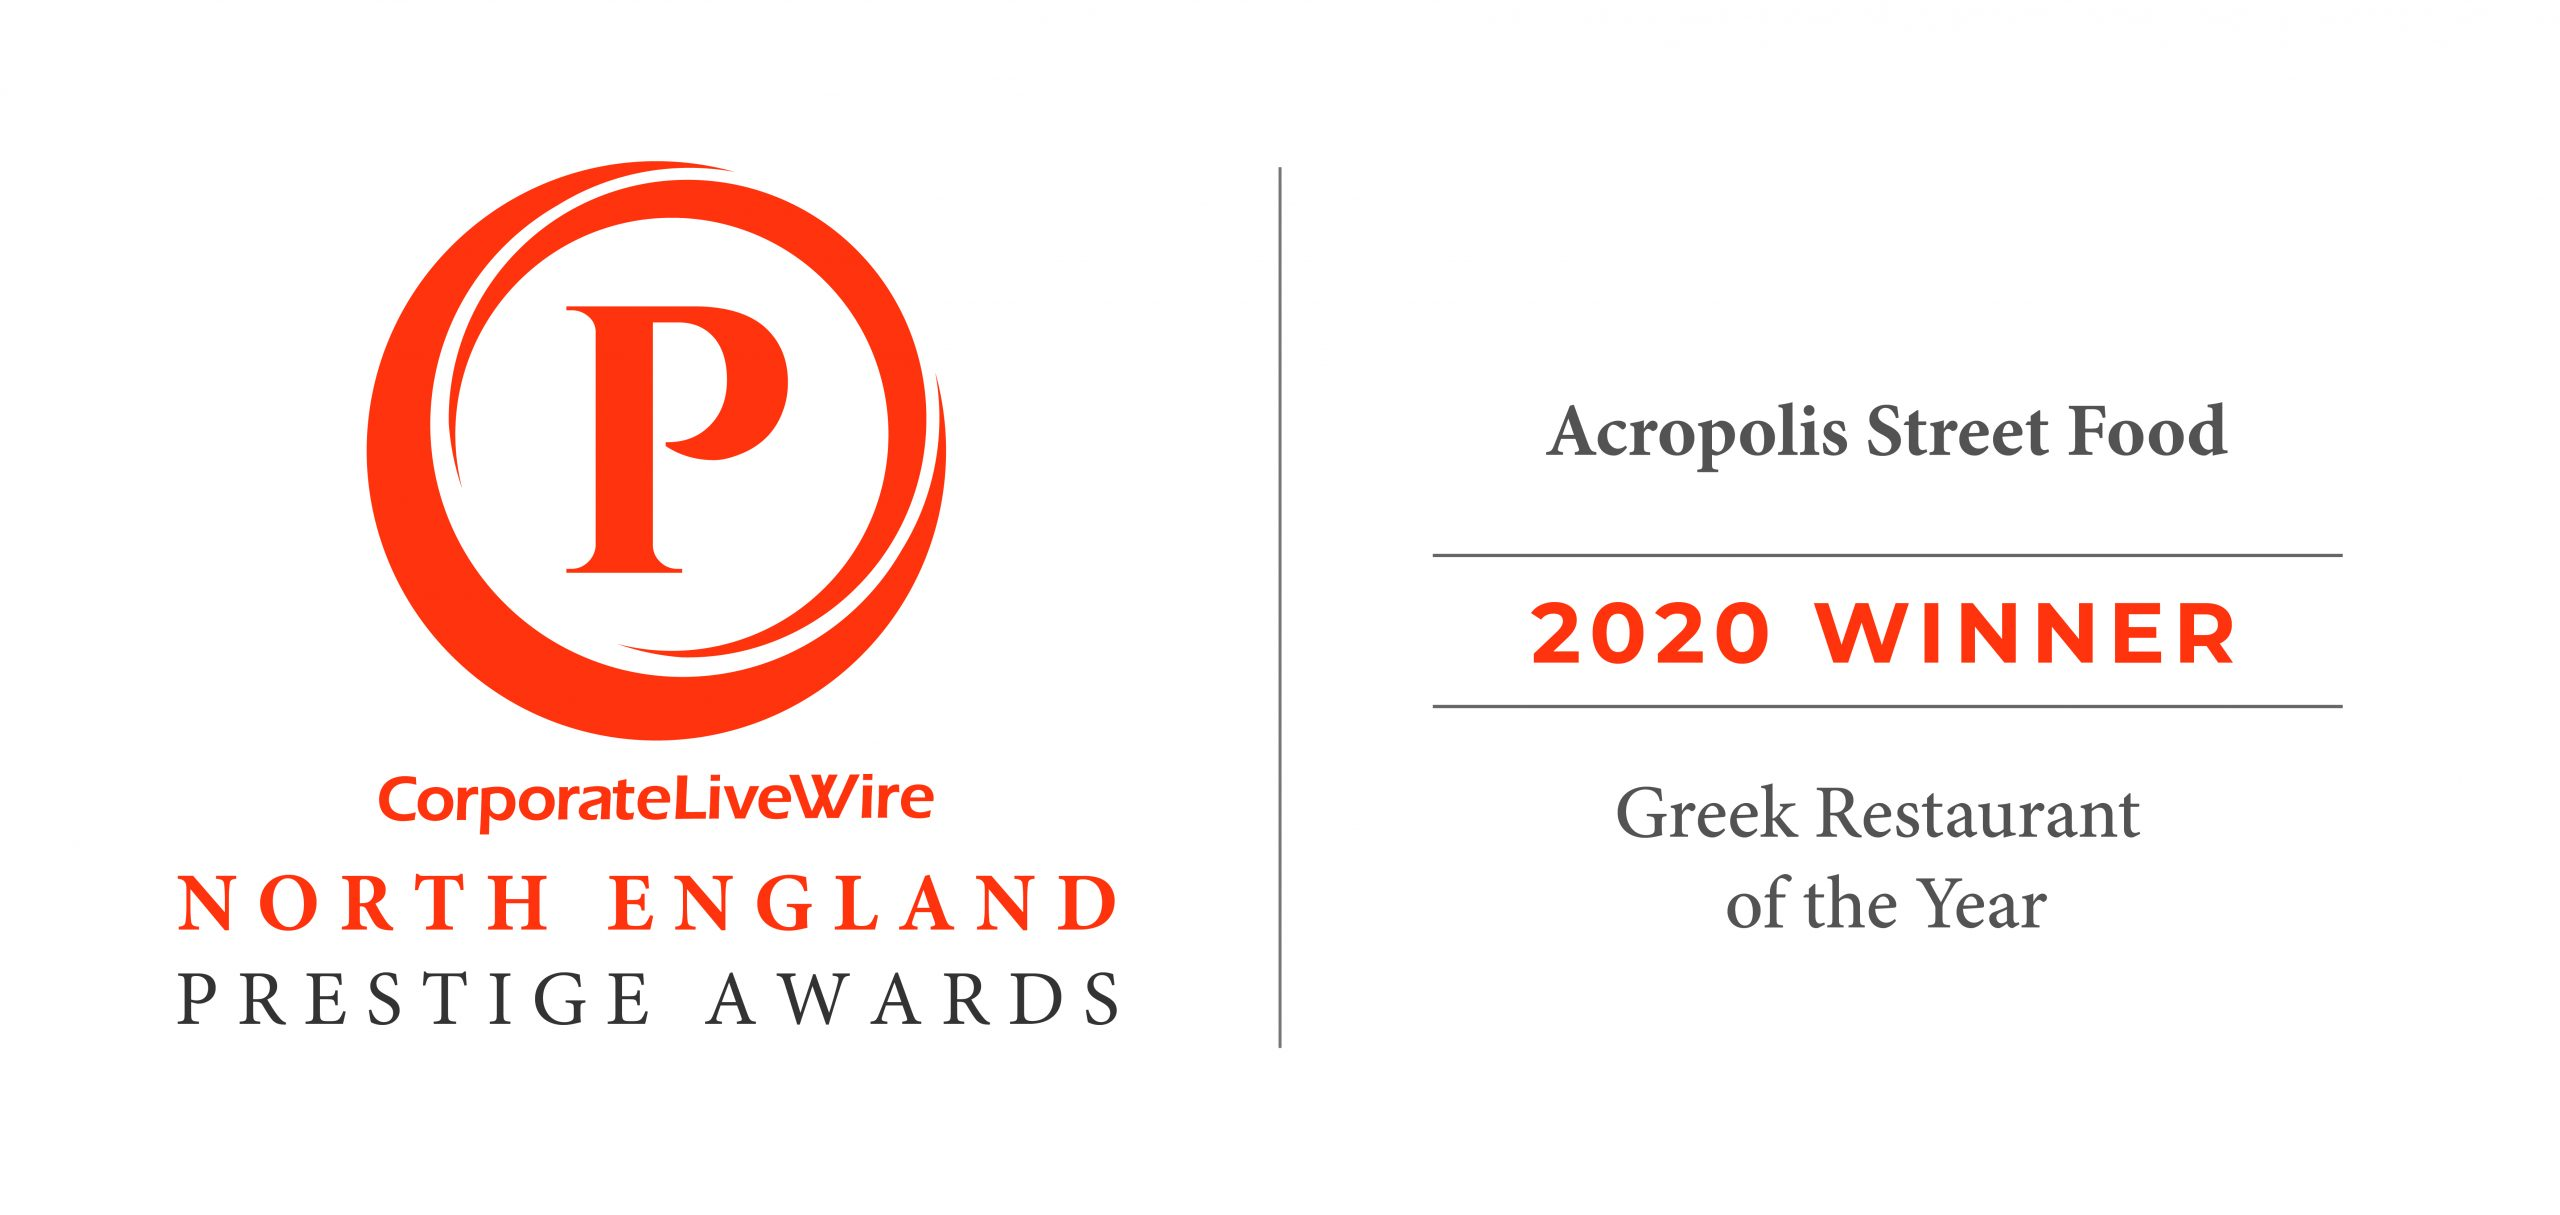 acropolis-street-food-24